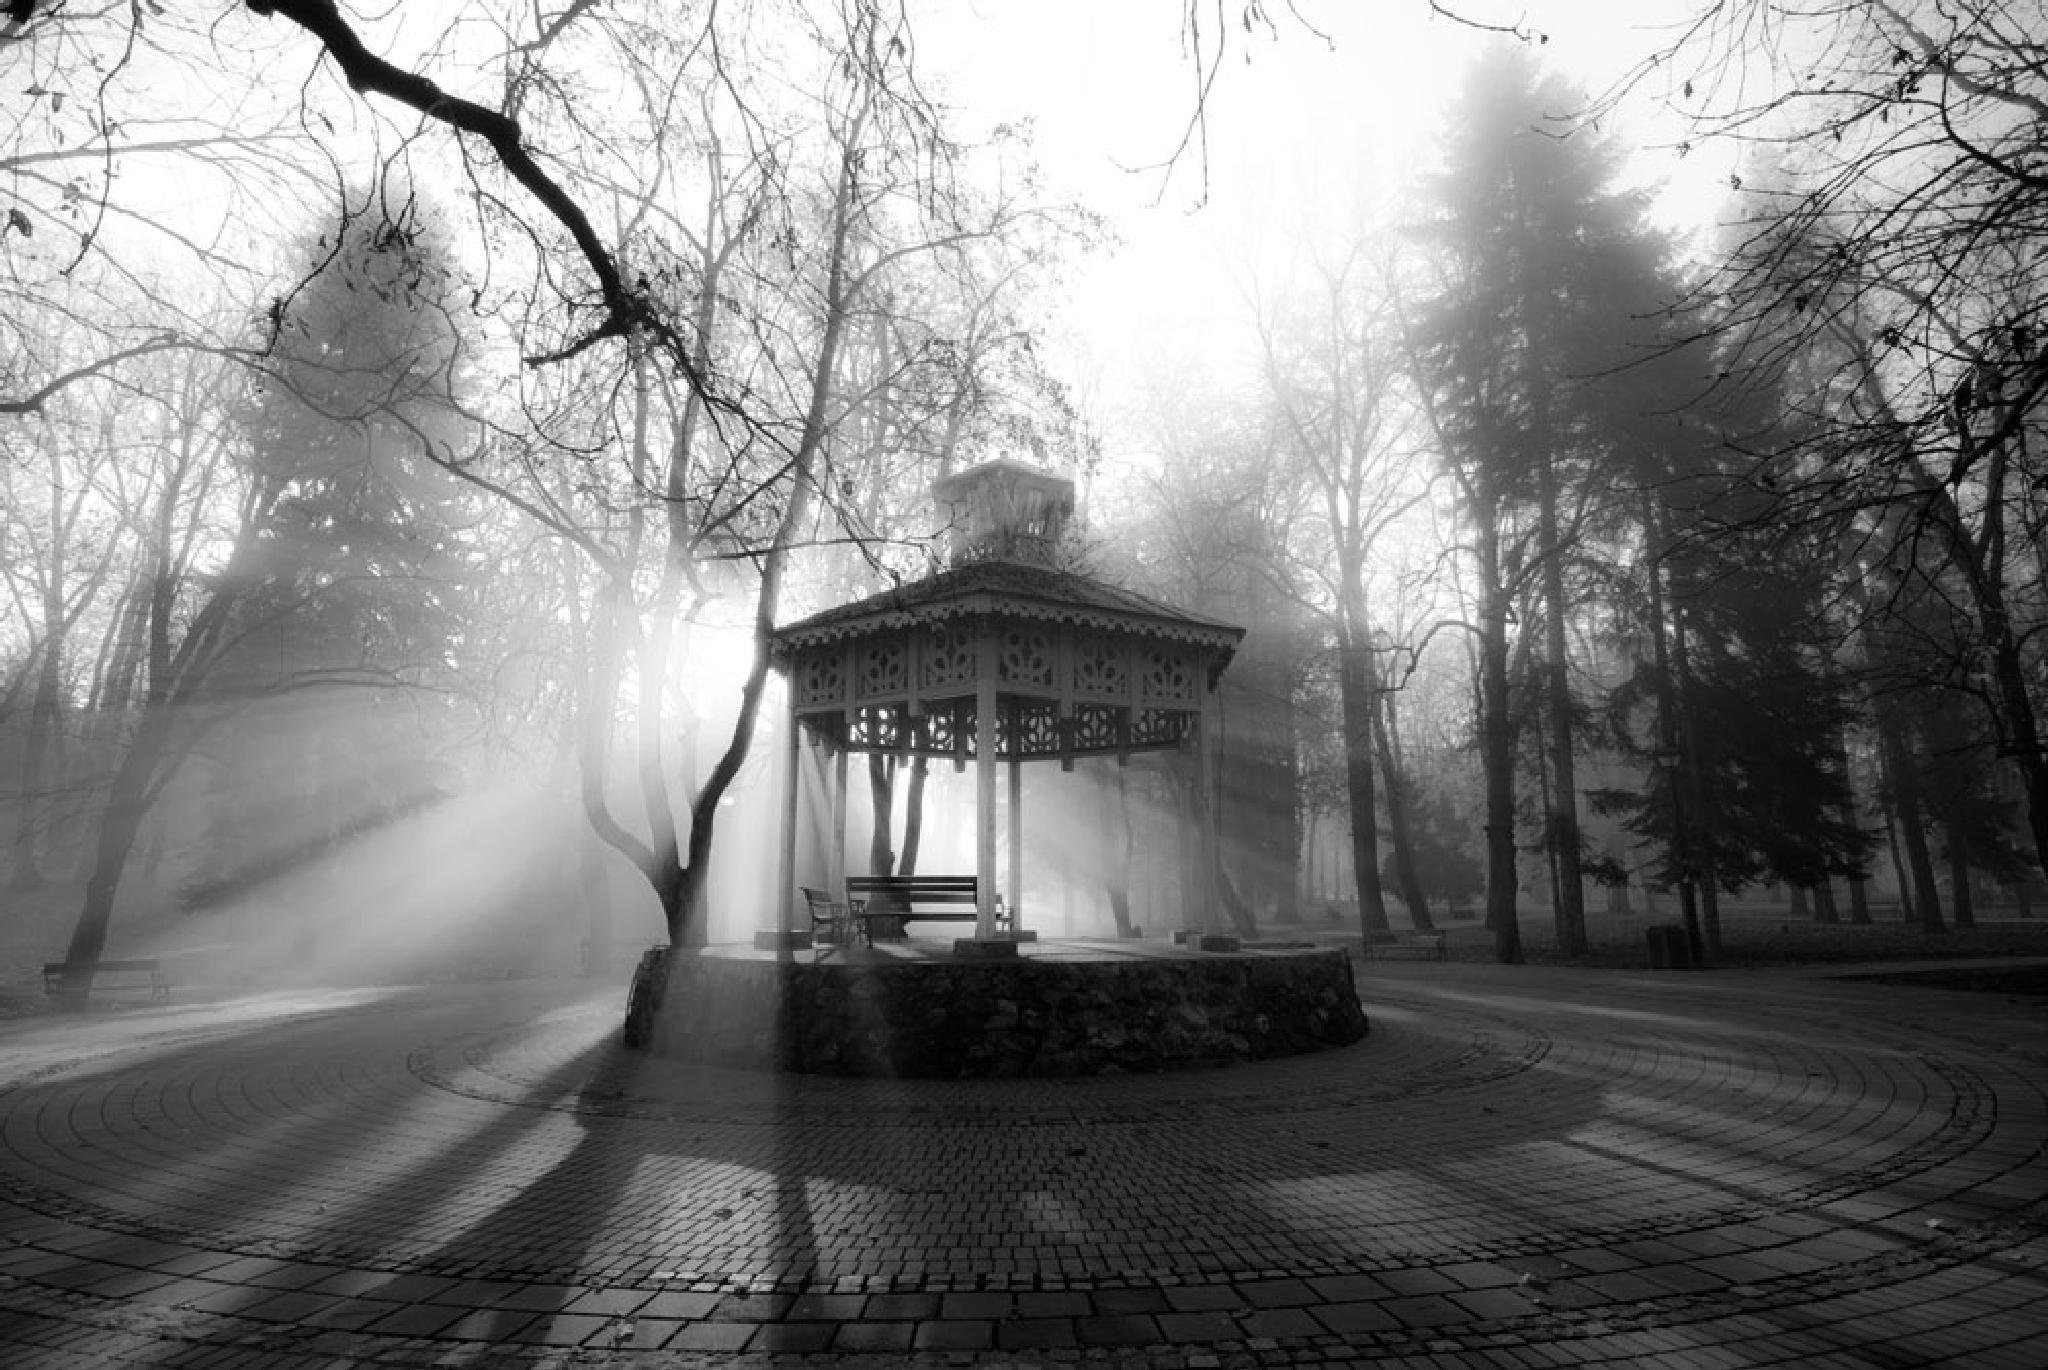 Morning by Djordje Petrovic